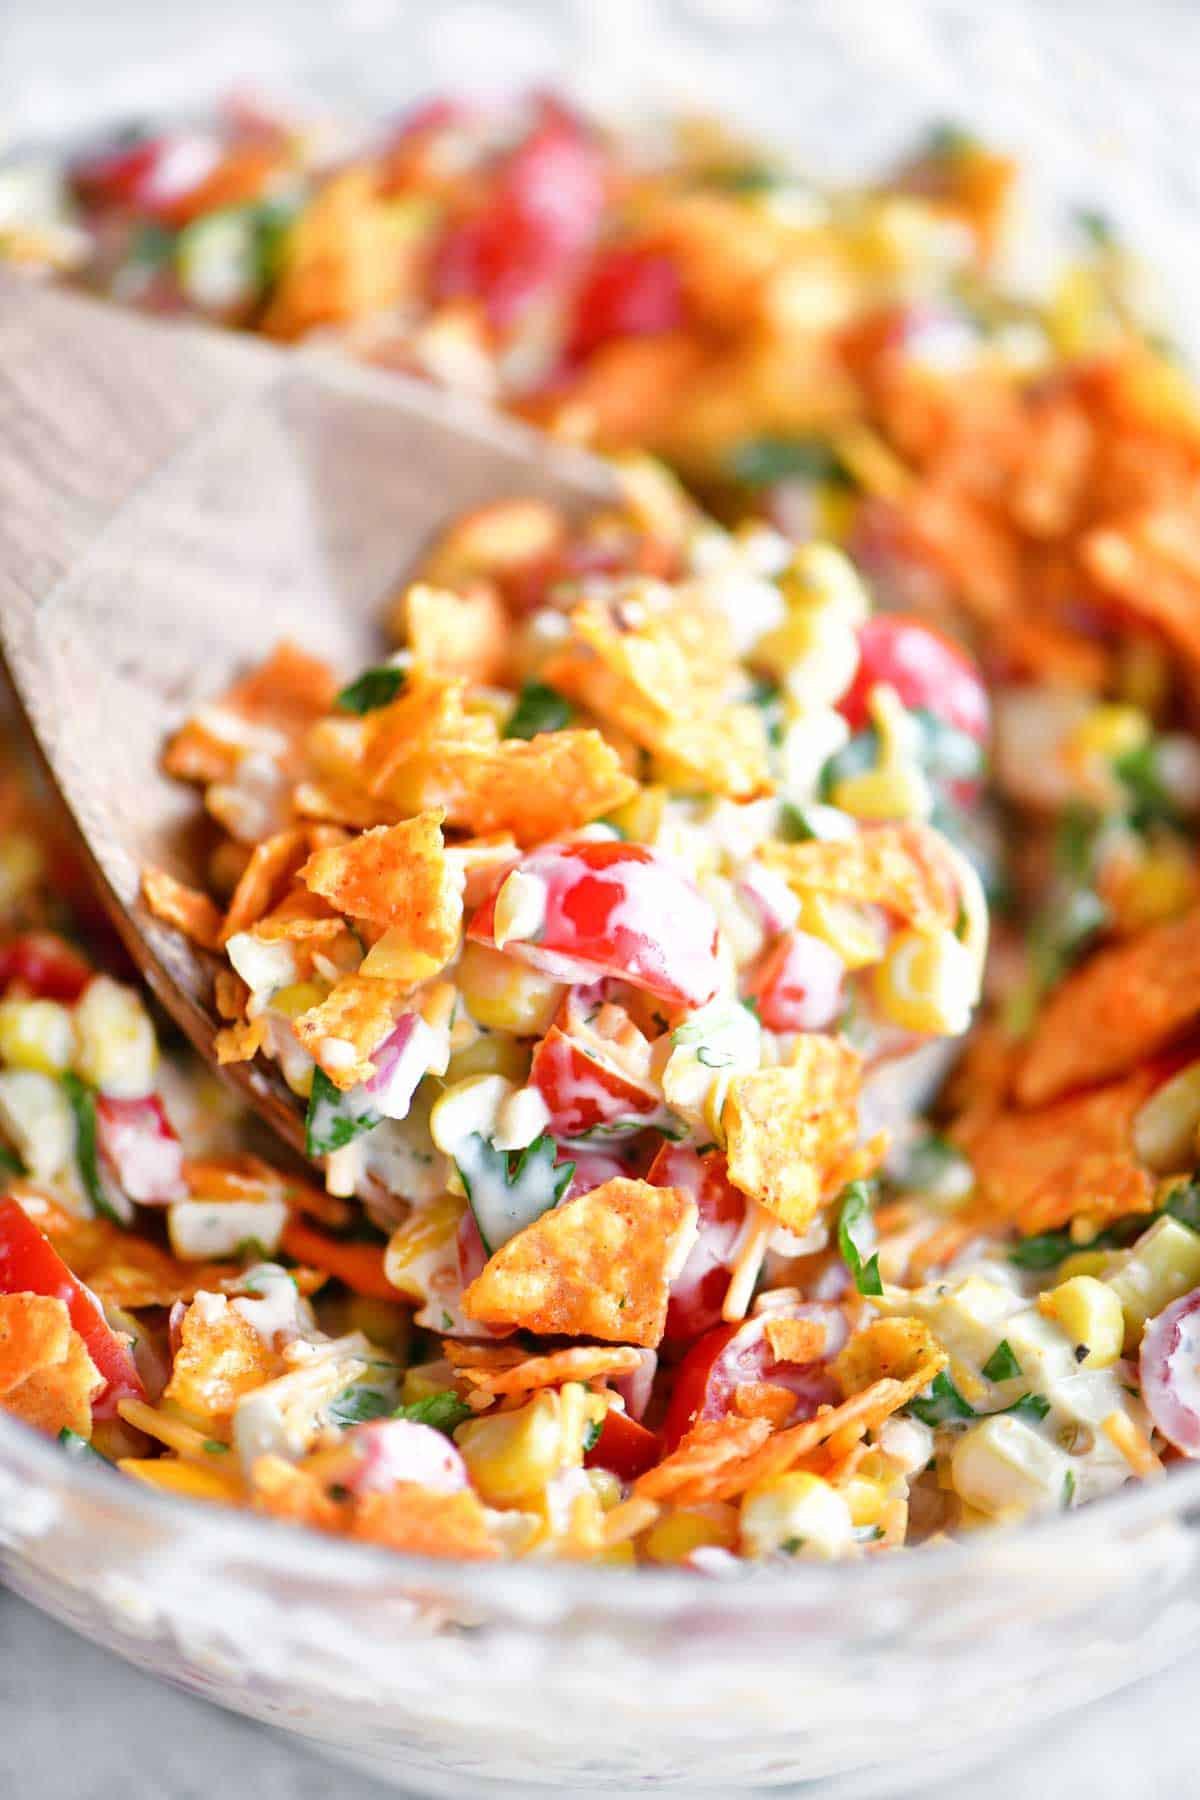 Recipe For Corn Salad  Corn Salad Recipe The Gunny Sack